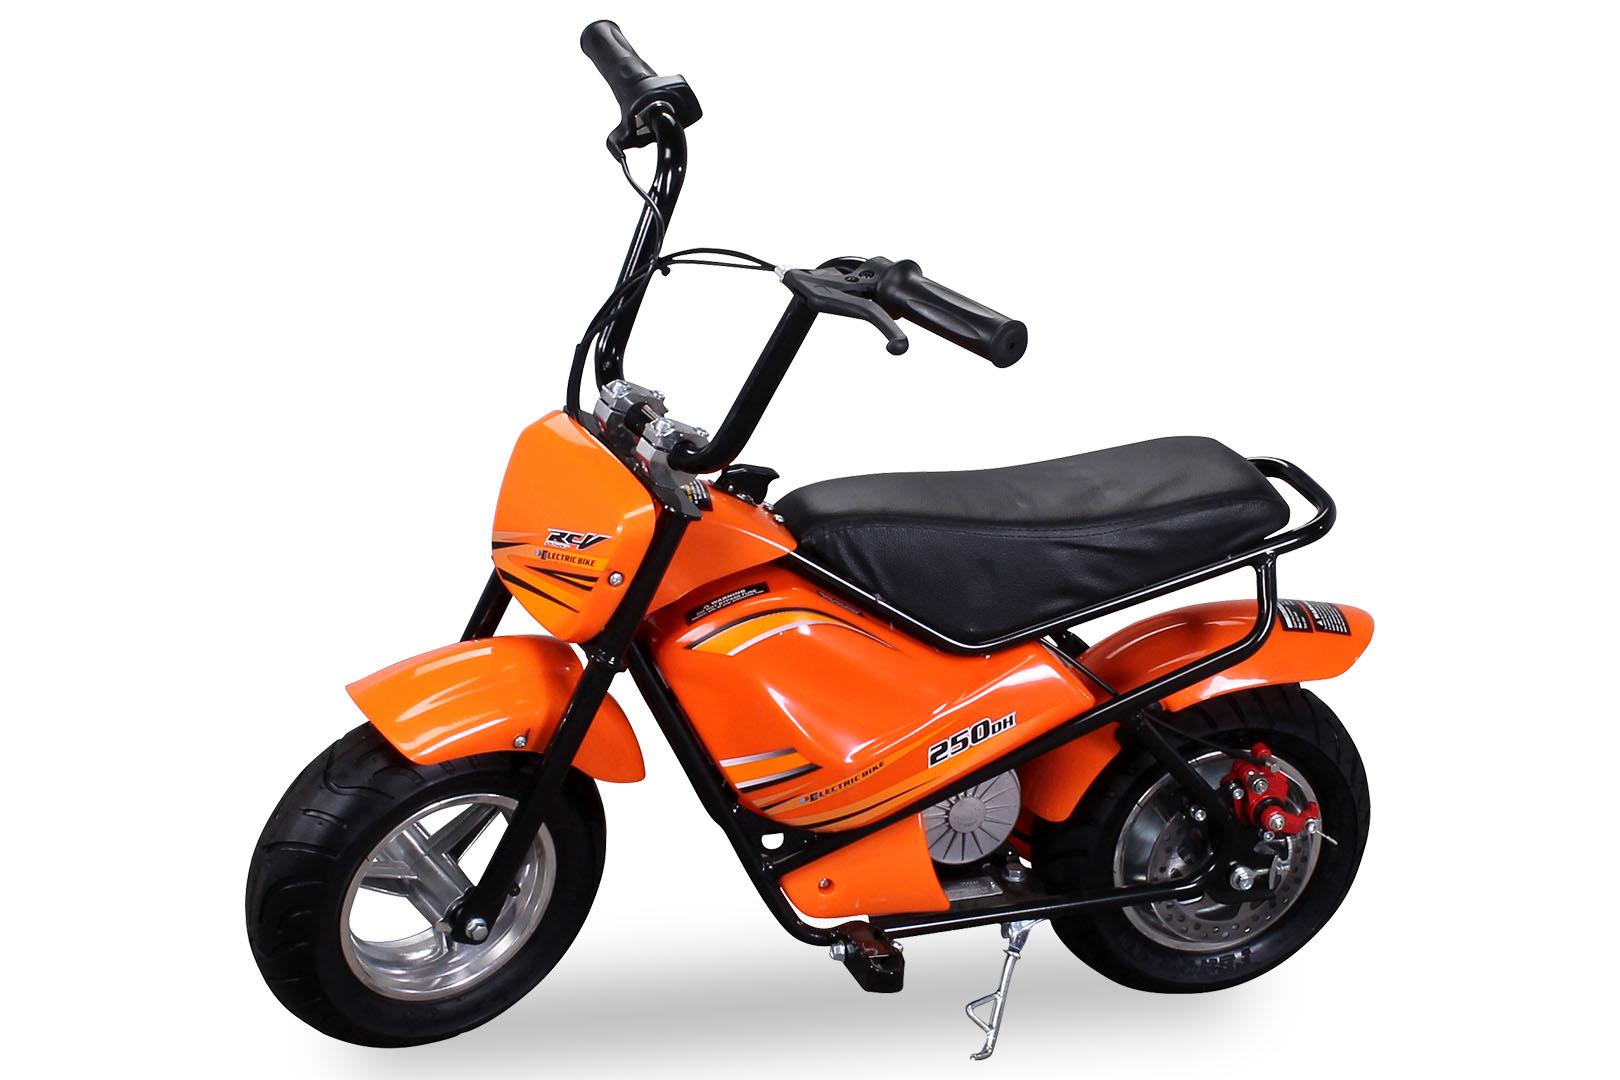 mini e bike minibike scooter sq250dh 250 watt electric. Black Bedroom Furniture Sets. Home Design Ideas